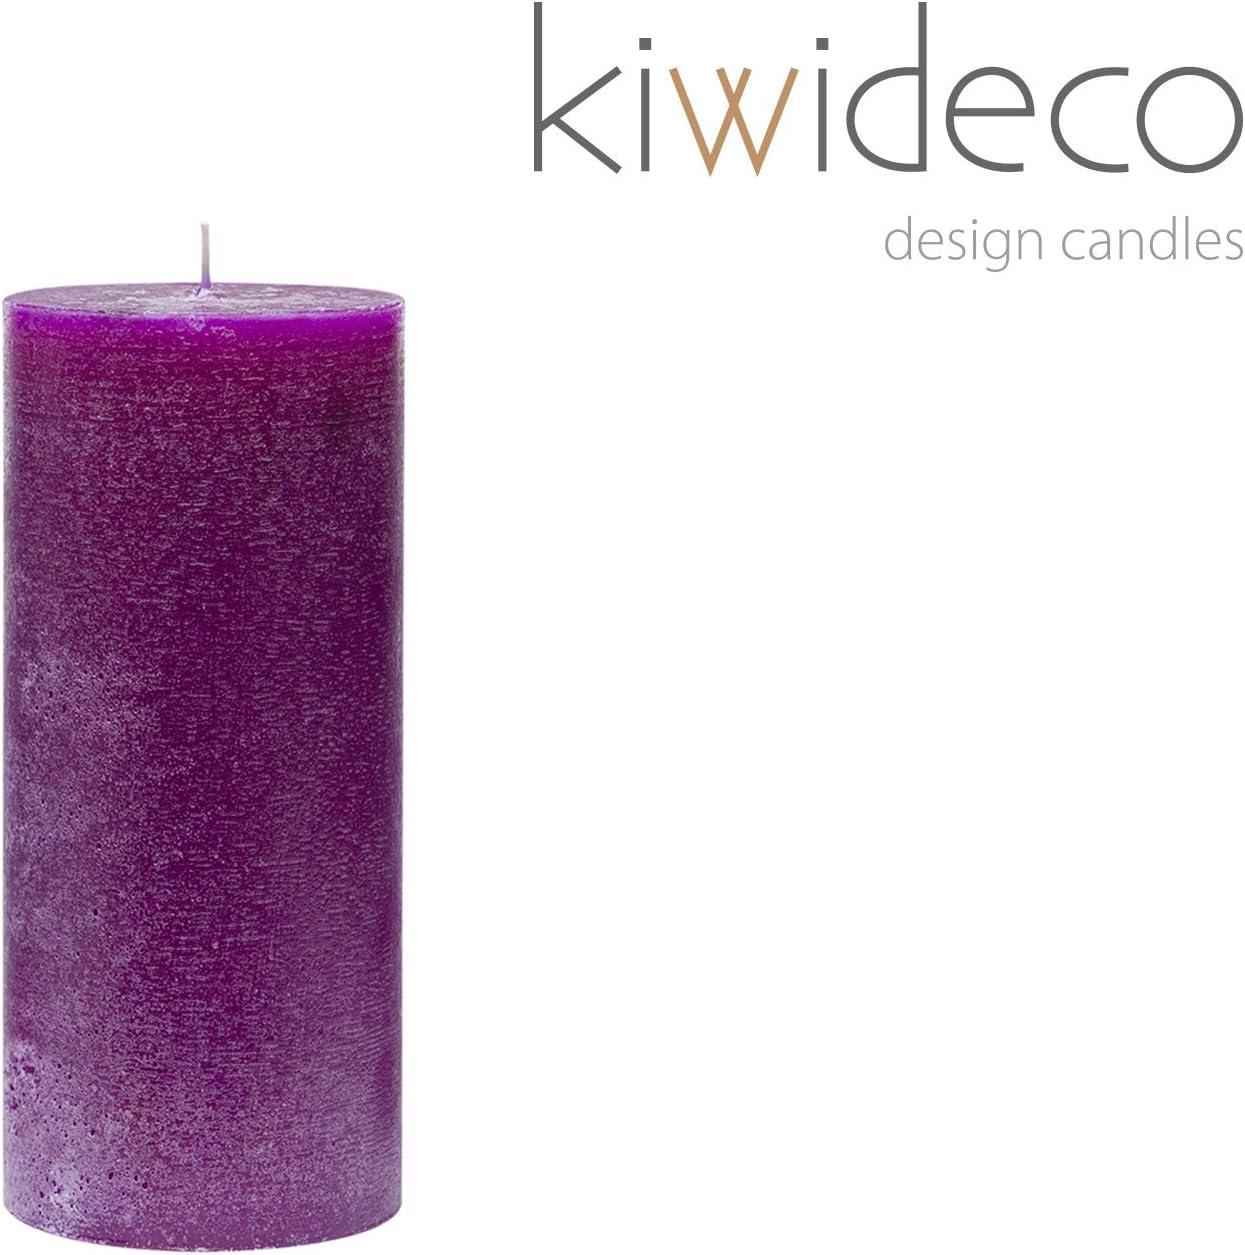 Handmade Purple Pillar Rustic Candle Candles Scandinavian Design Home Decor For Modern Interior Design Amazon Co Uk Kitchen Home